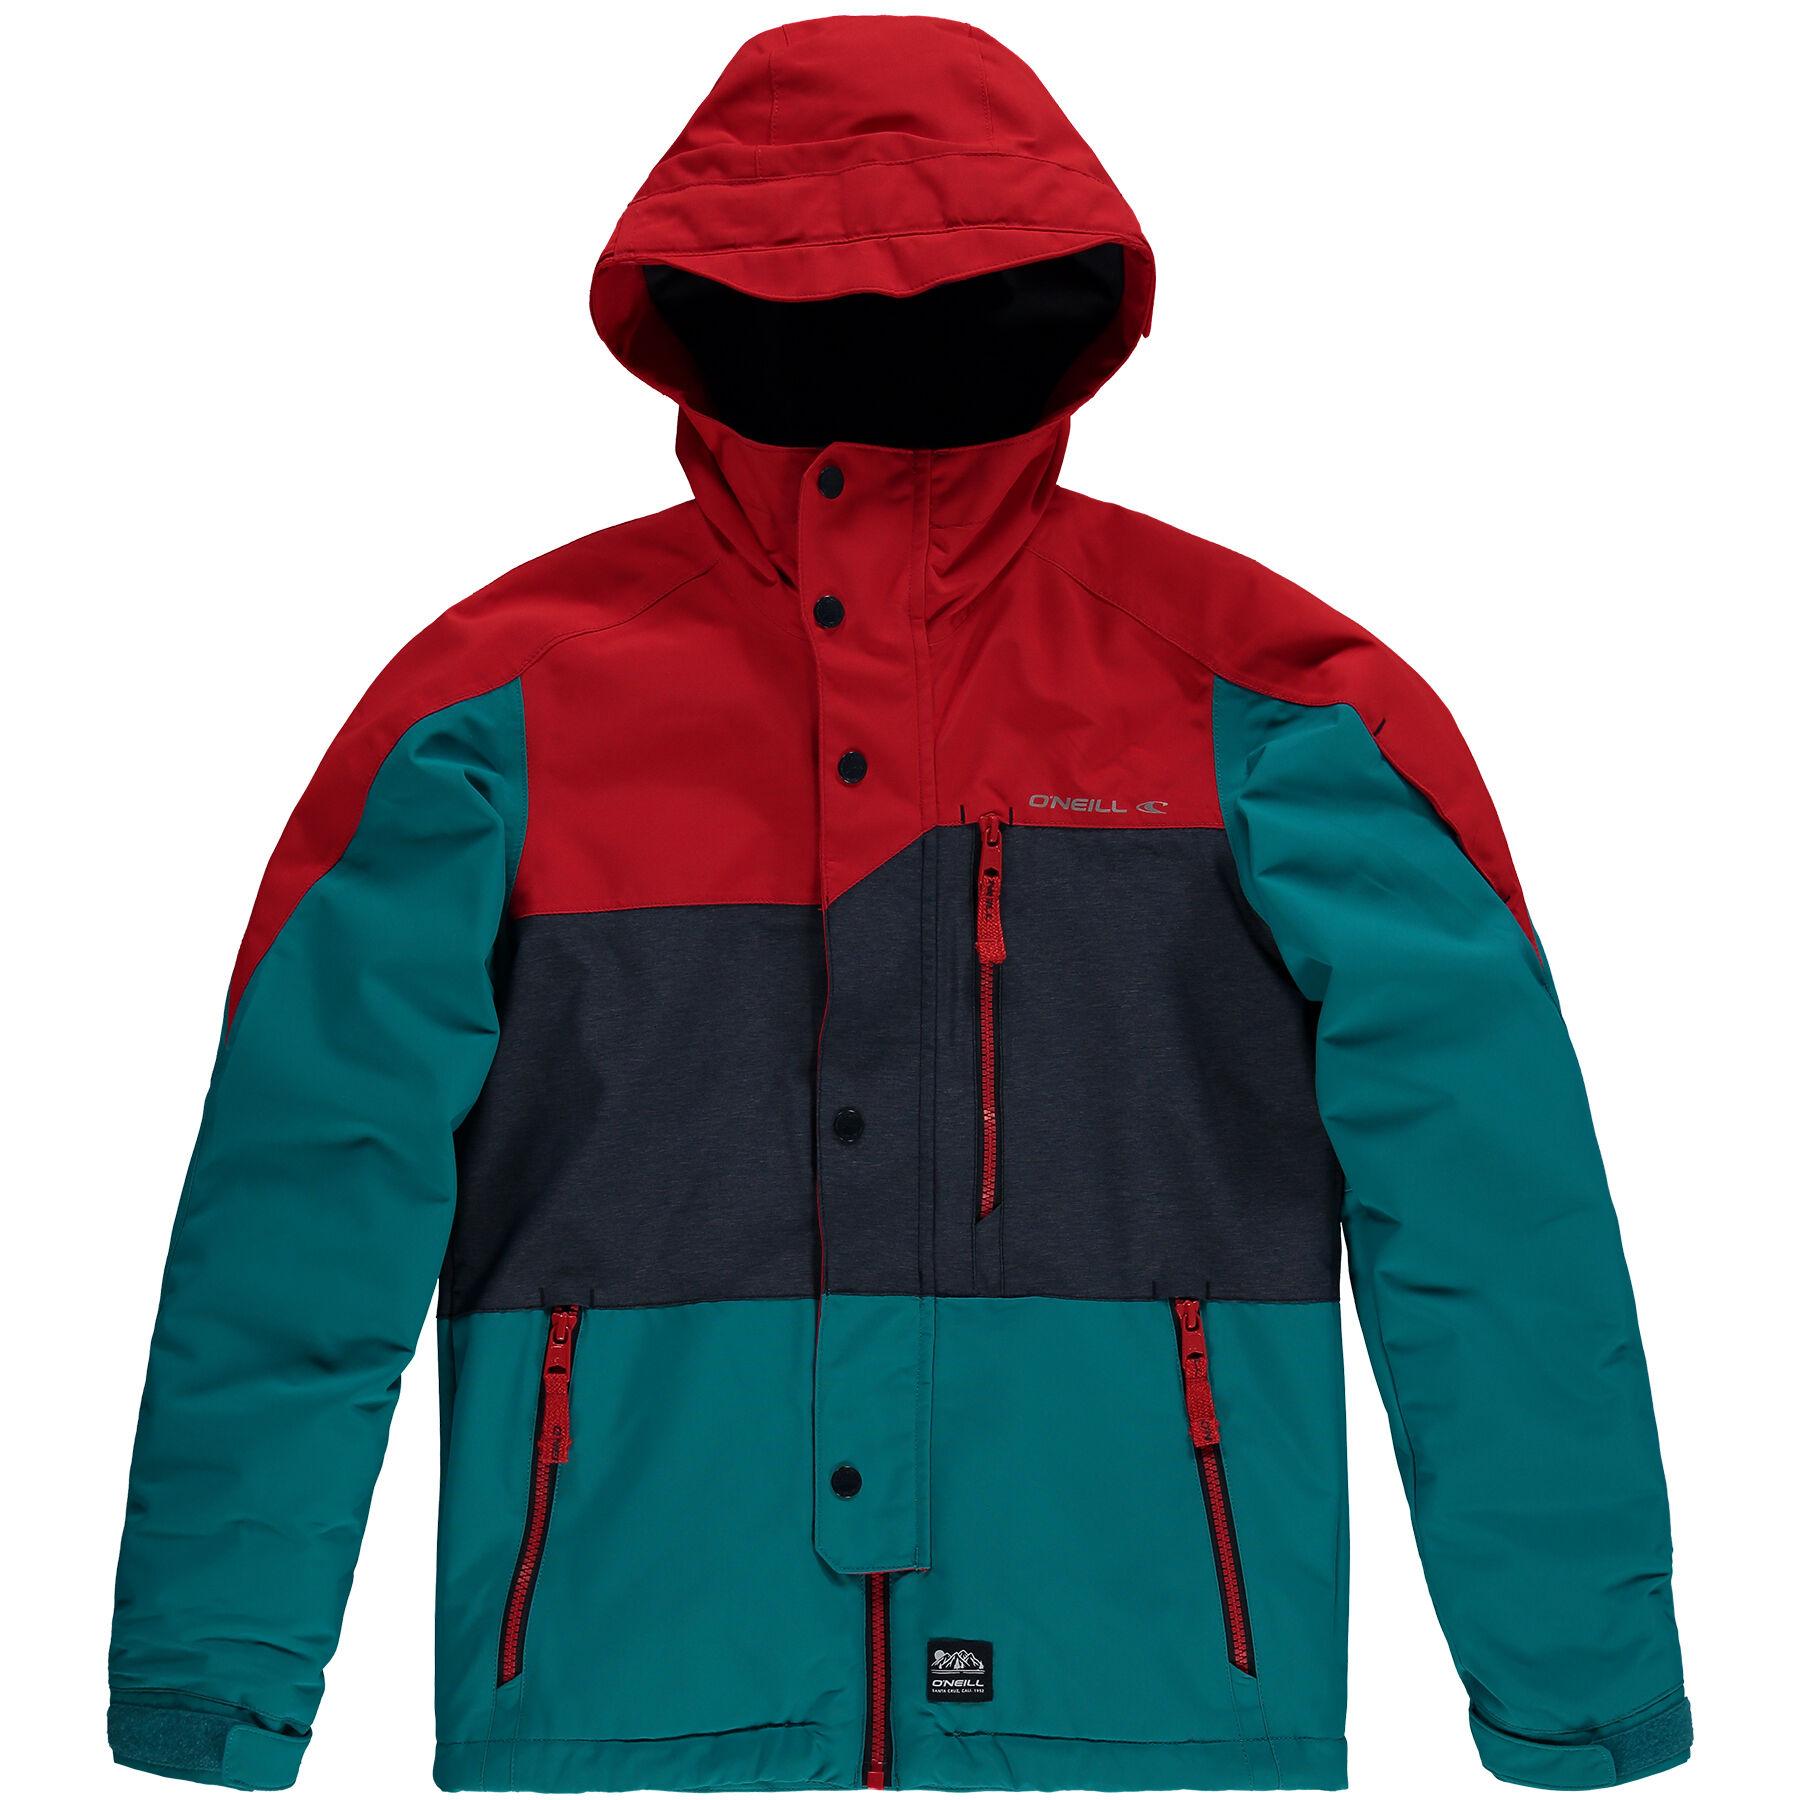 ... Dialled Ski / Snowboard Jacket ...